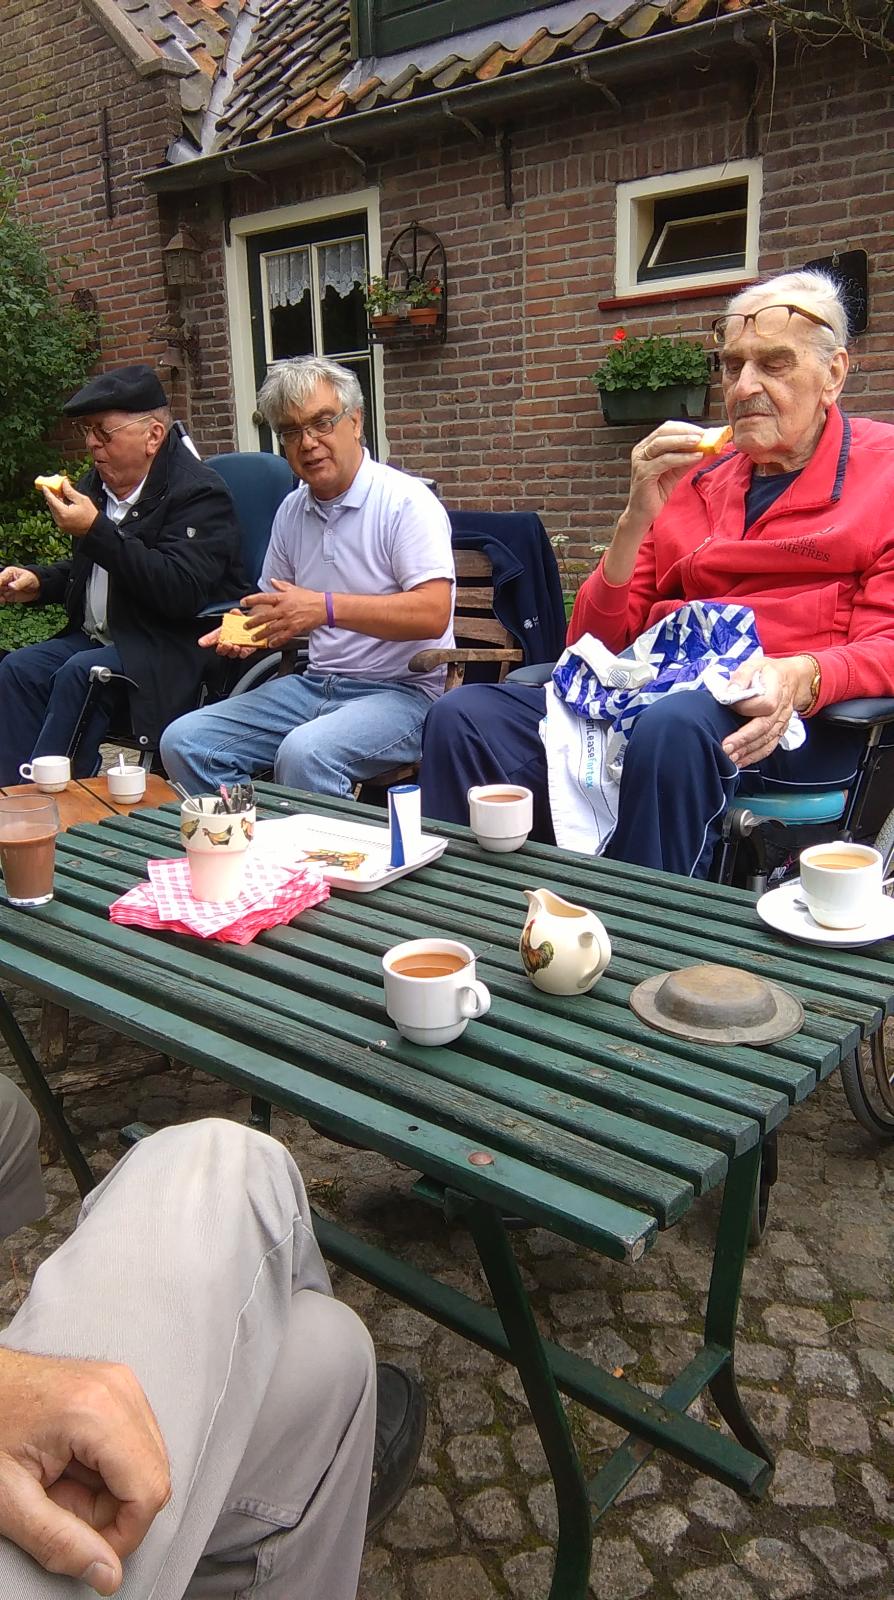 http://uvv-zoetermeer.nl/wp-content/uploads/2017/03/IMAG0032-2.png